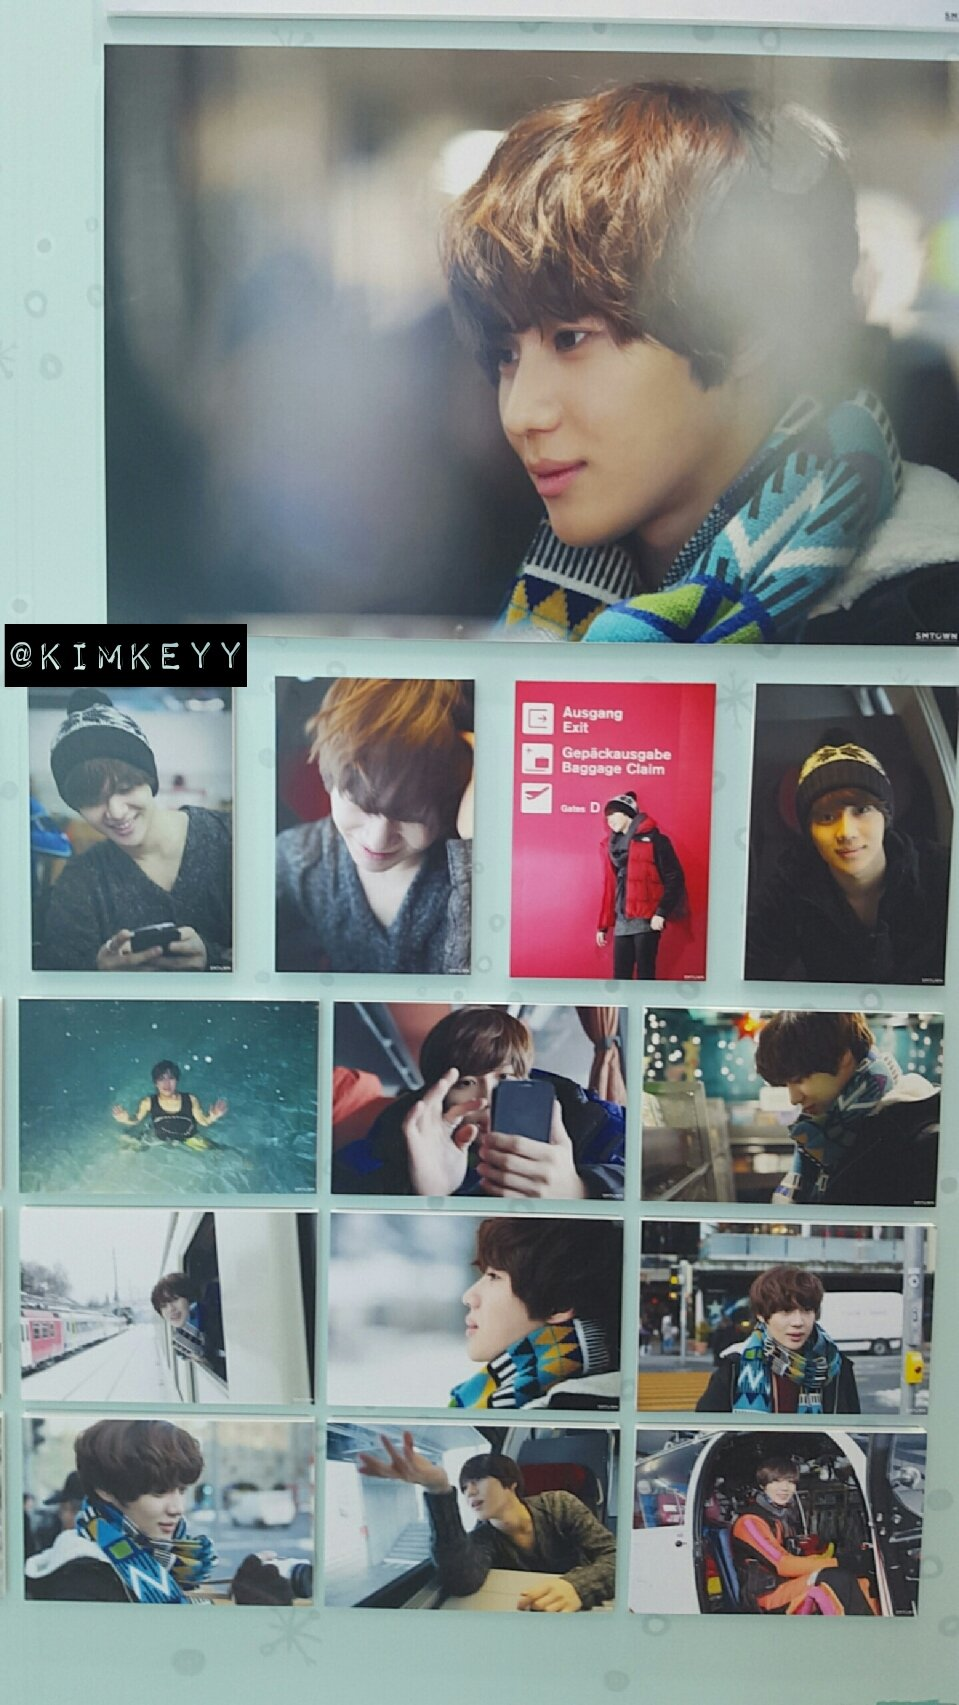 SHINee @ SHINee Surprise Vacation Exhibition 24680269644_452ab7313c_o